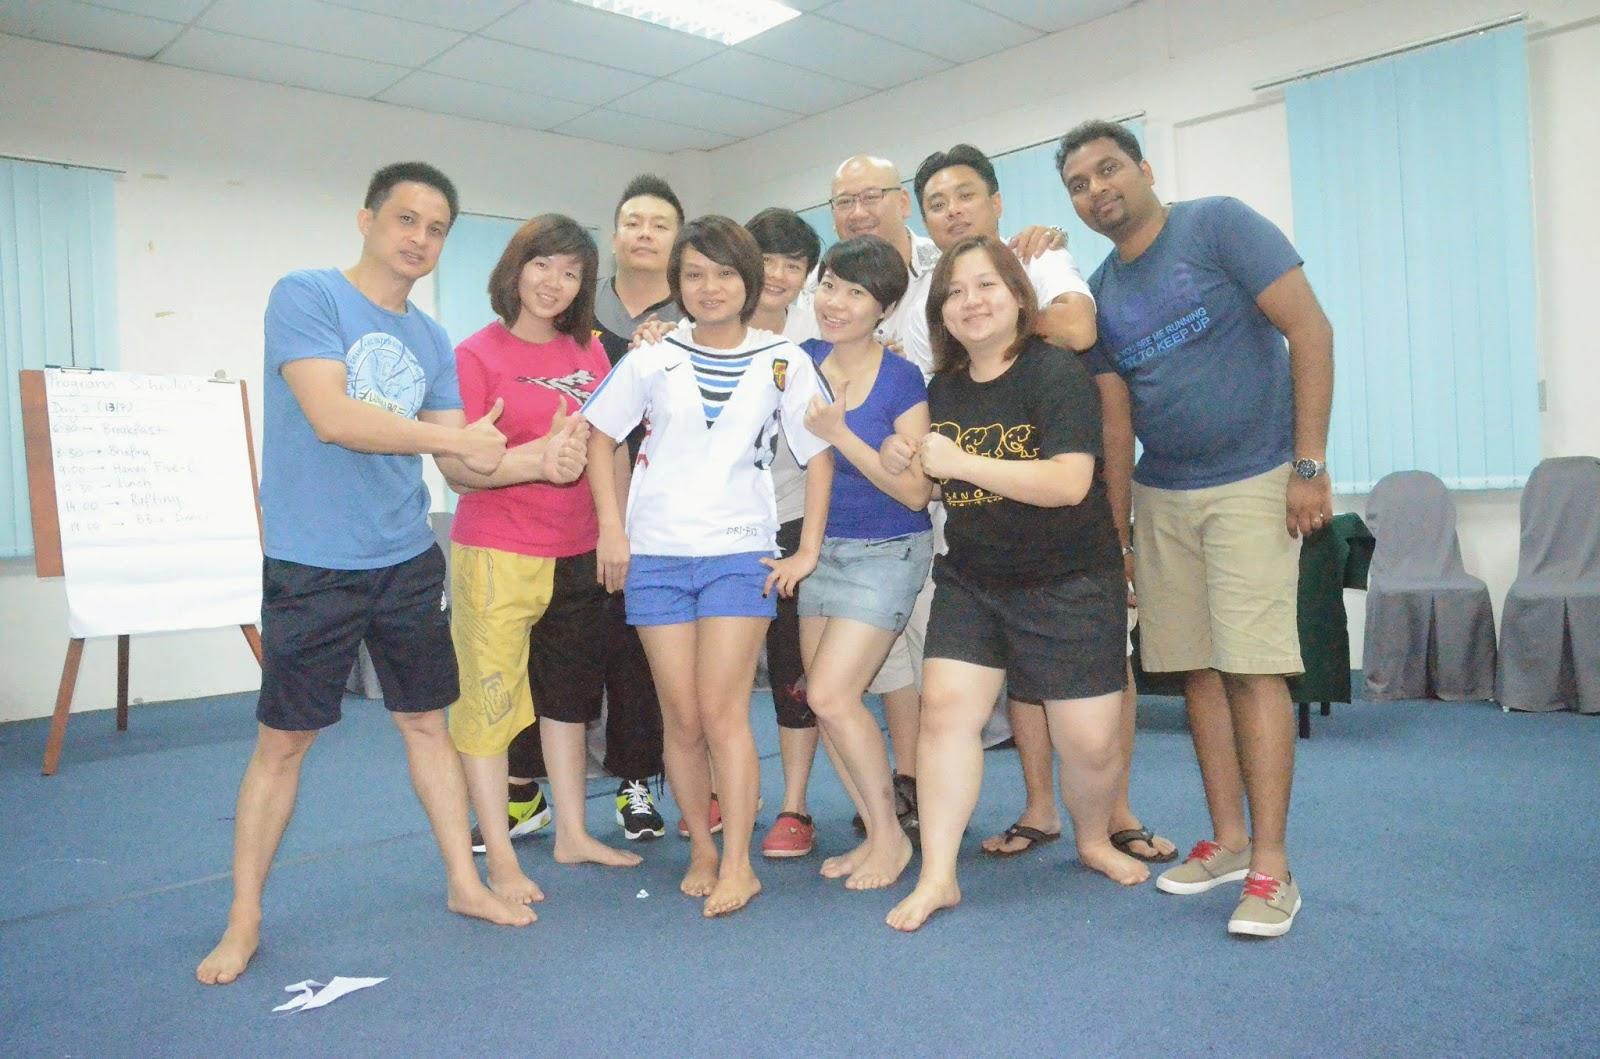 Malaysia Adventure Teambuilding Pangkor - www.malaysia-adventuretours.com